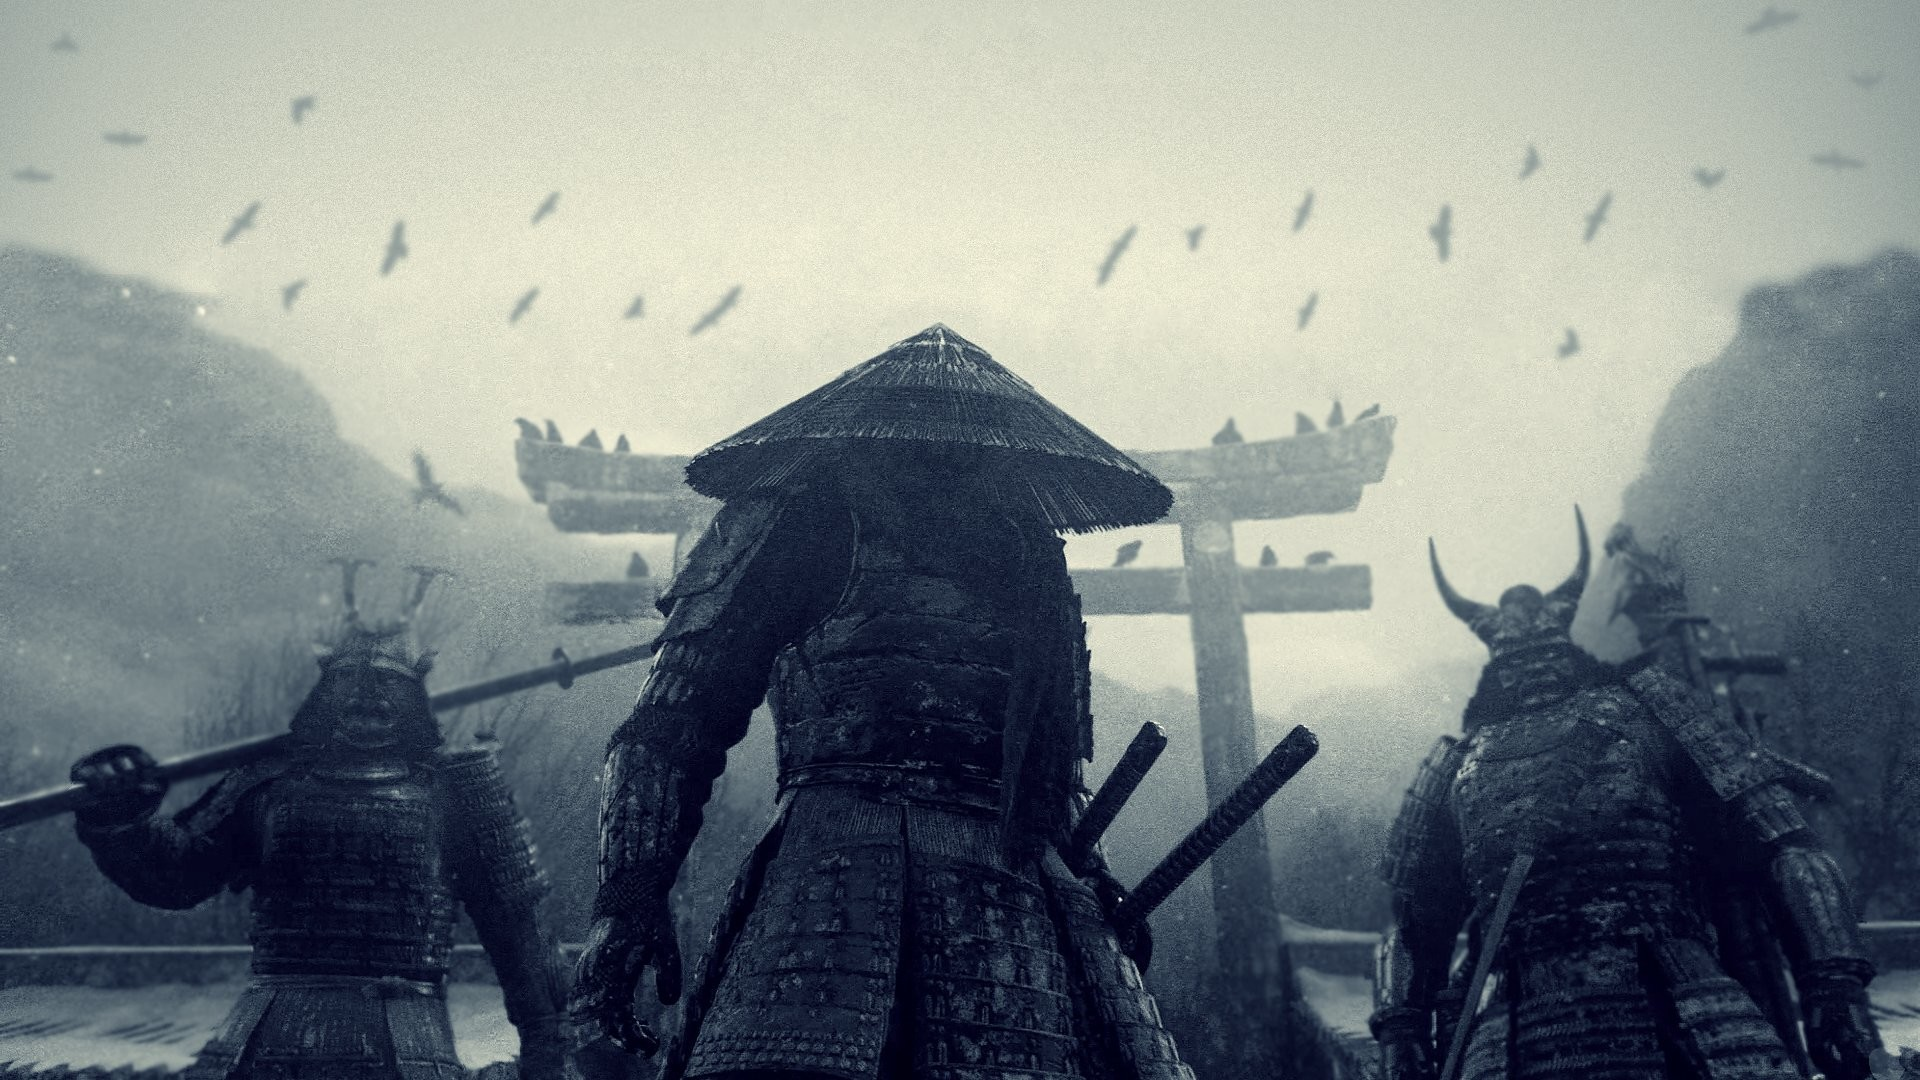 Best Photo: Samurai Wallpapers, px